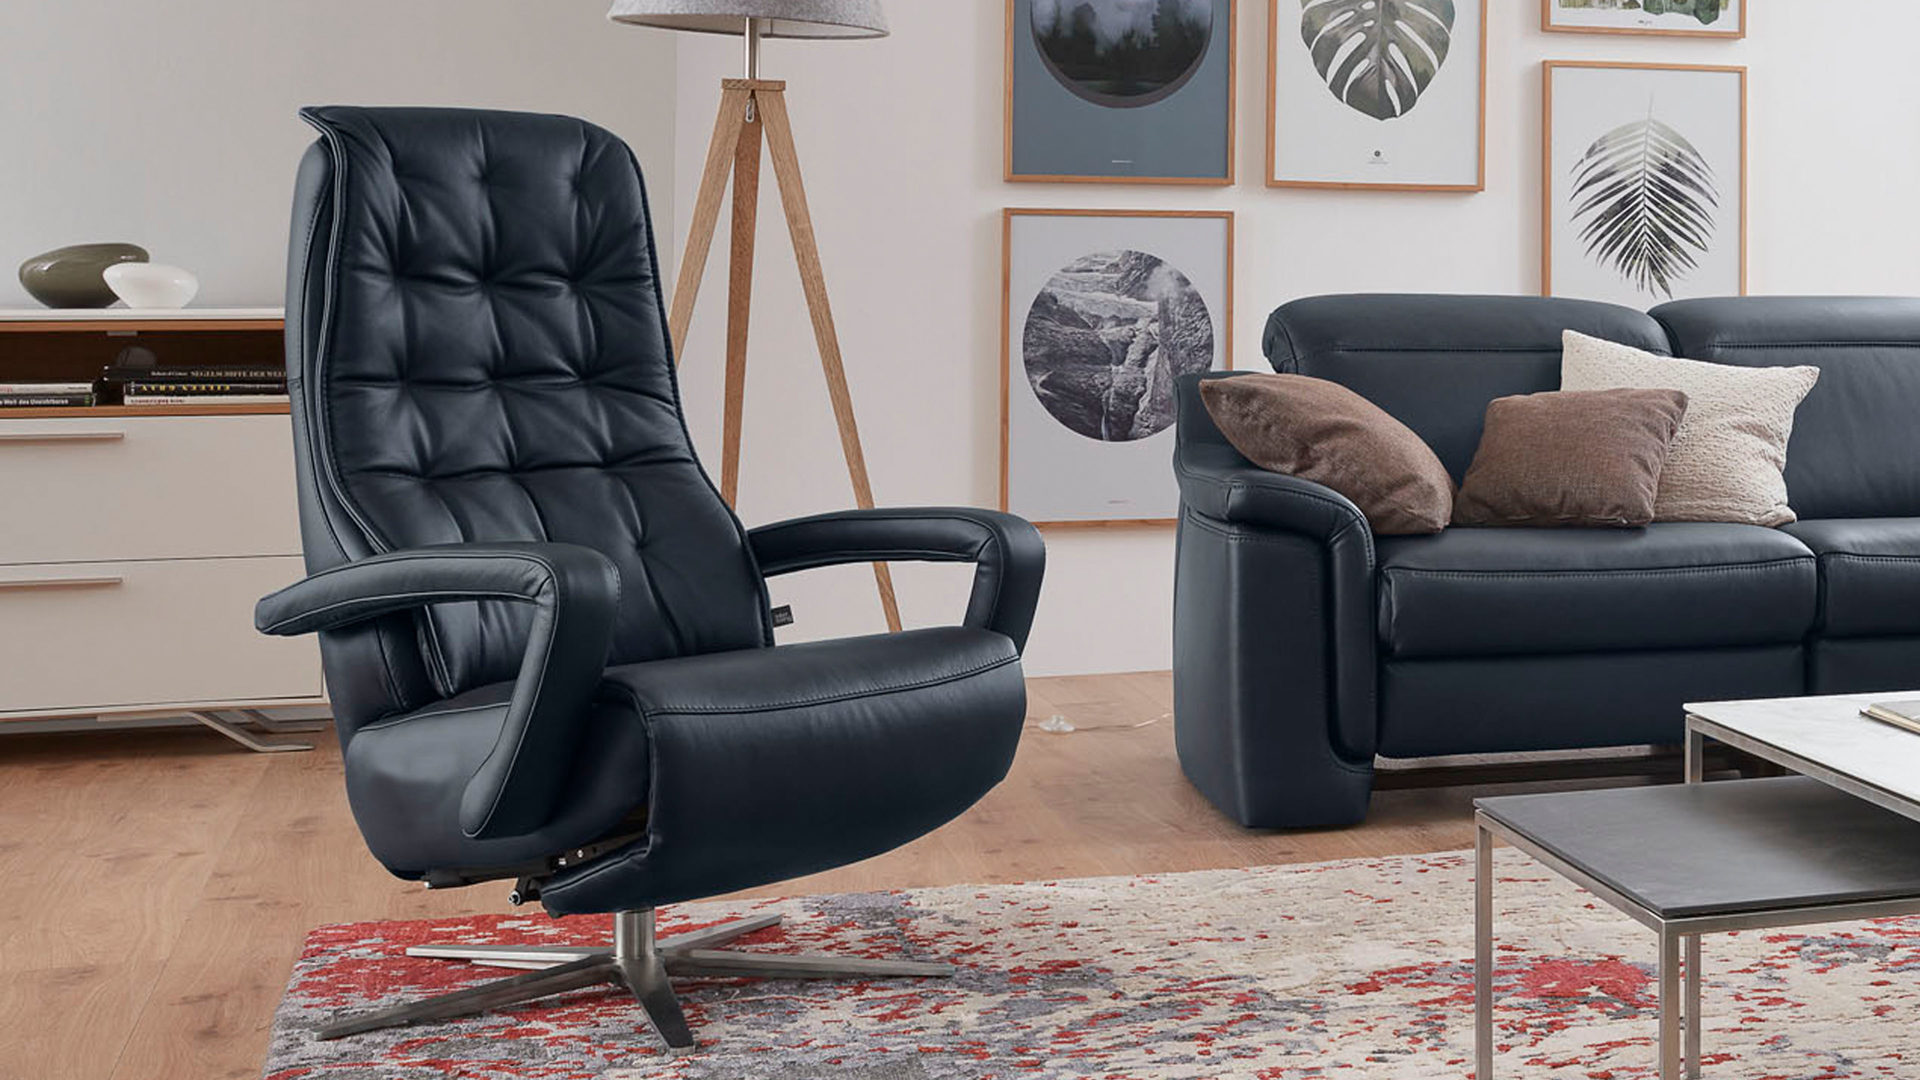 Interliving Sessel Serie 4502 Relaxsessel Nachtblaues Longlife Leder